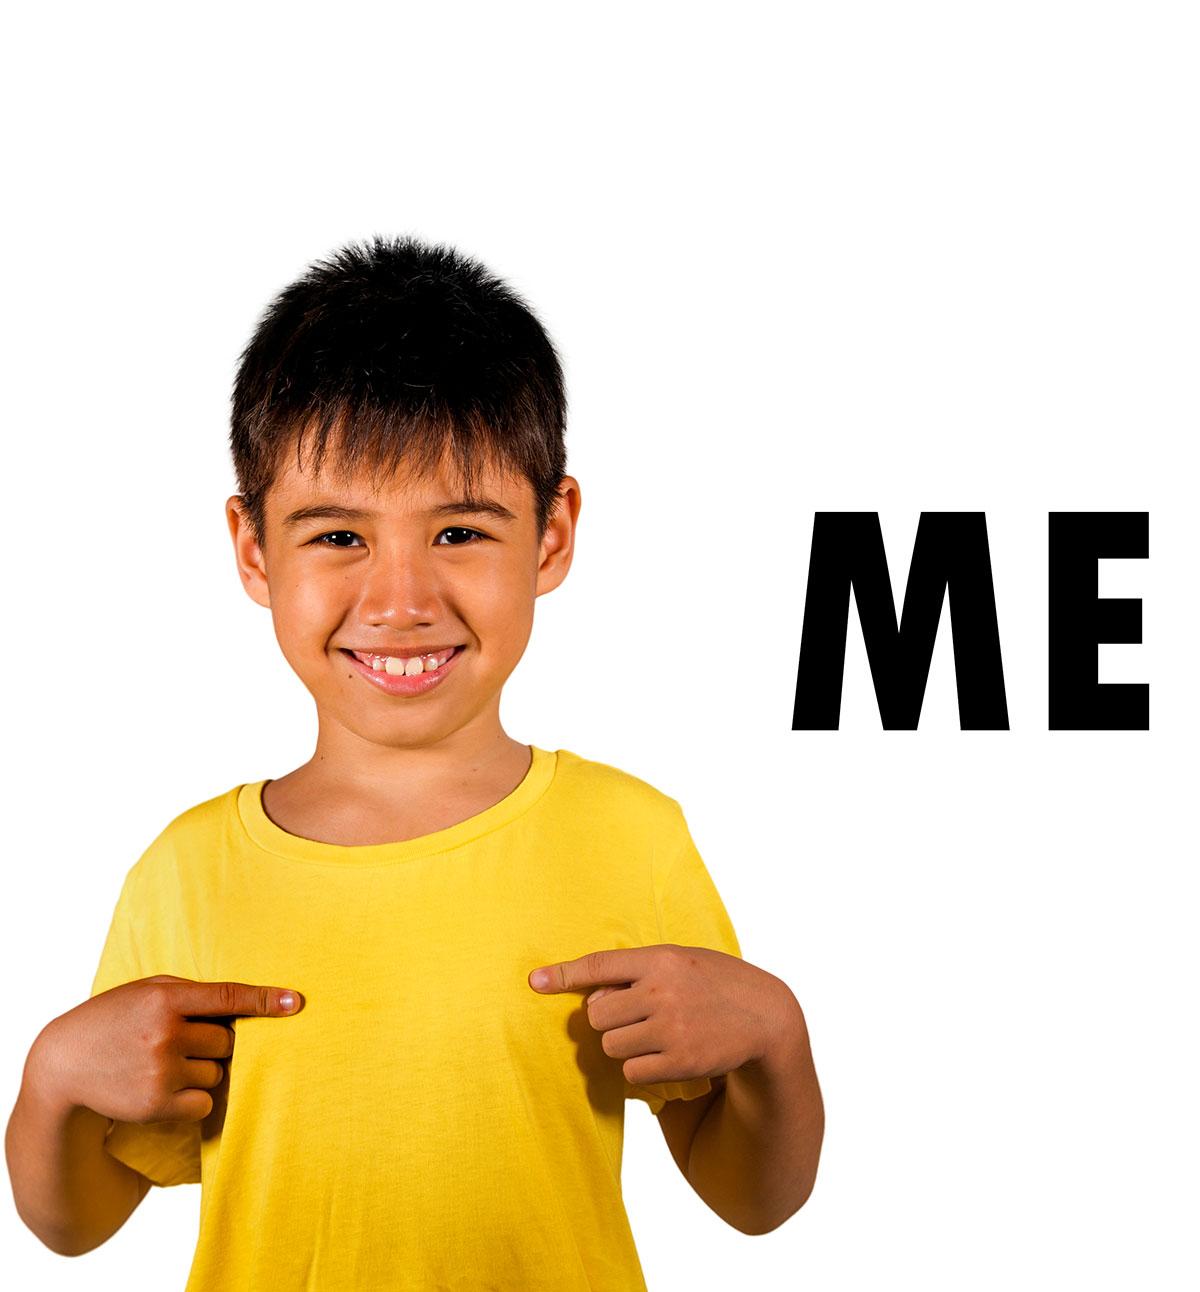 B4School FUN - Alphabet Adventure - Y is for Yourself